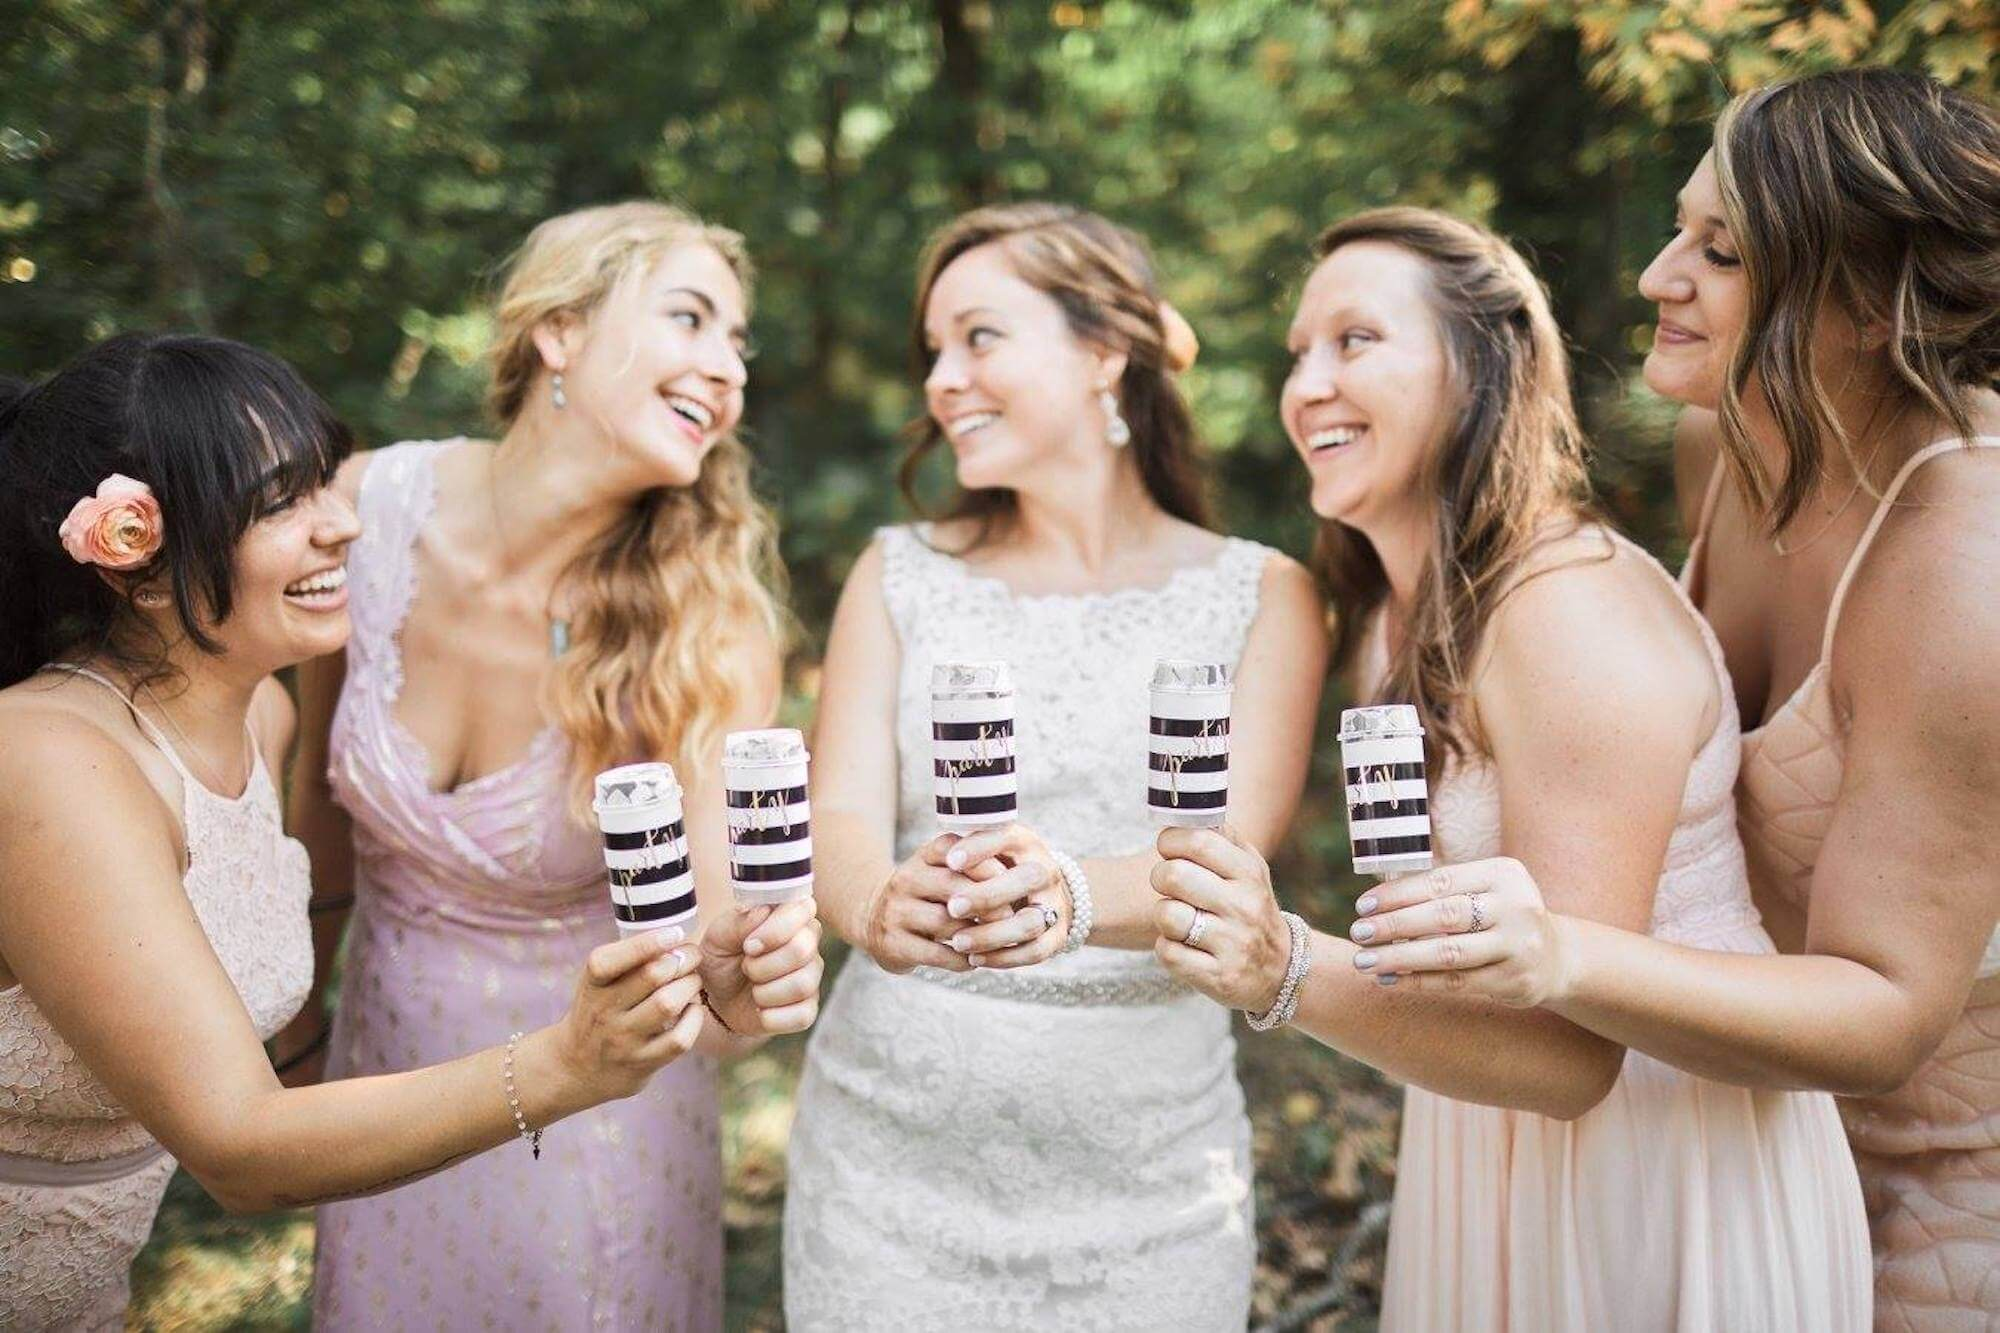 engle-olson-wedding-video-perry-james-photography-9.jpg